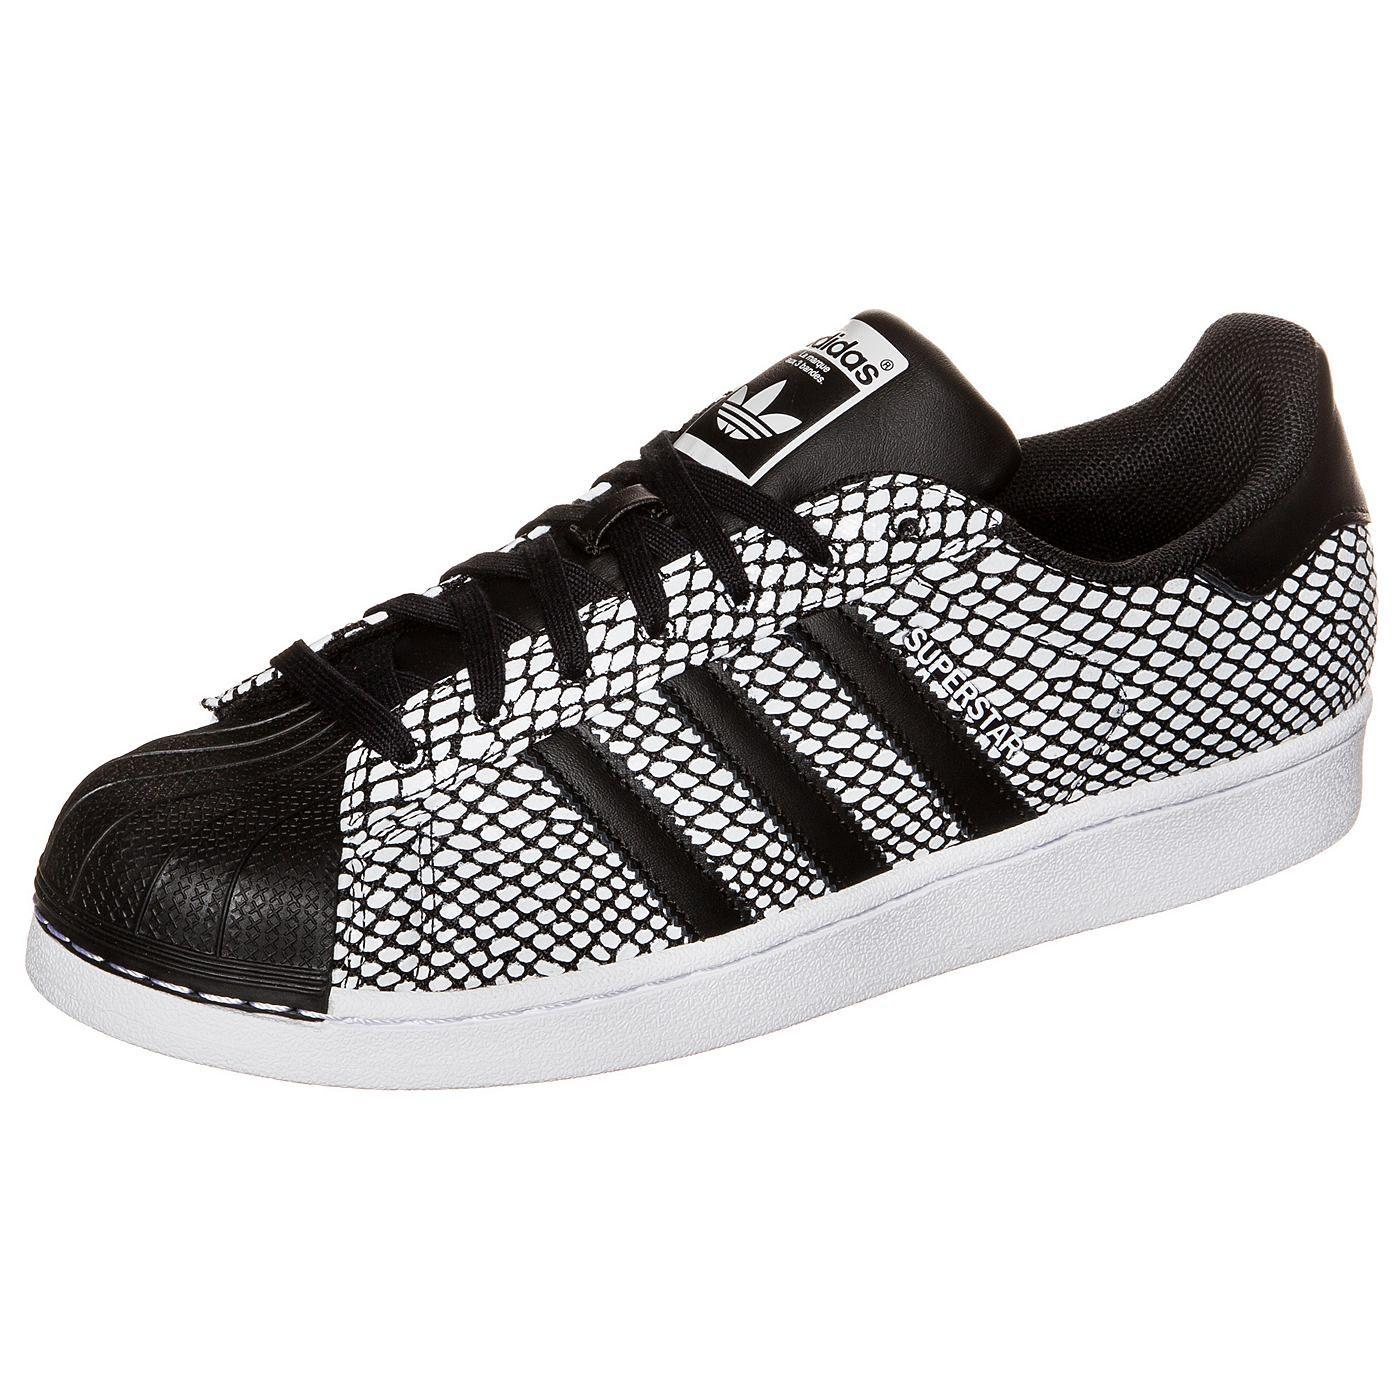 adidas Originals Superstar Snake Pack Sneaker auf Stylelounge.de